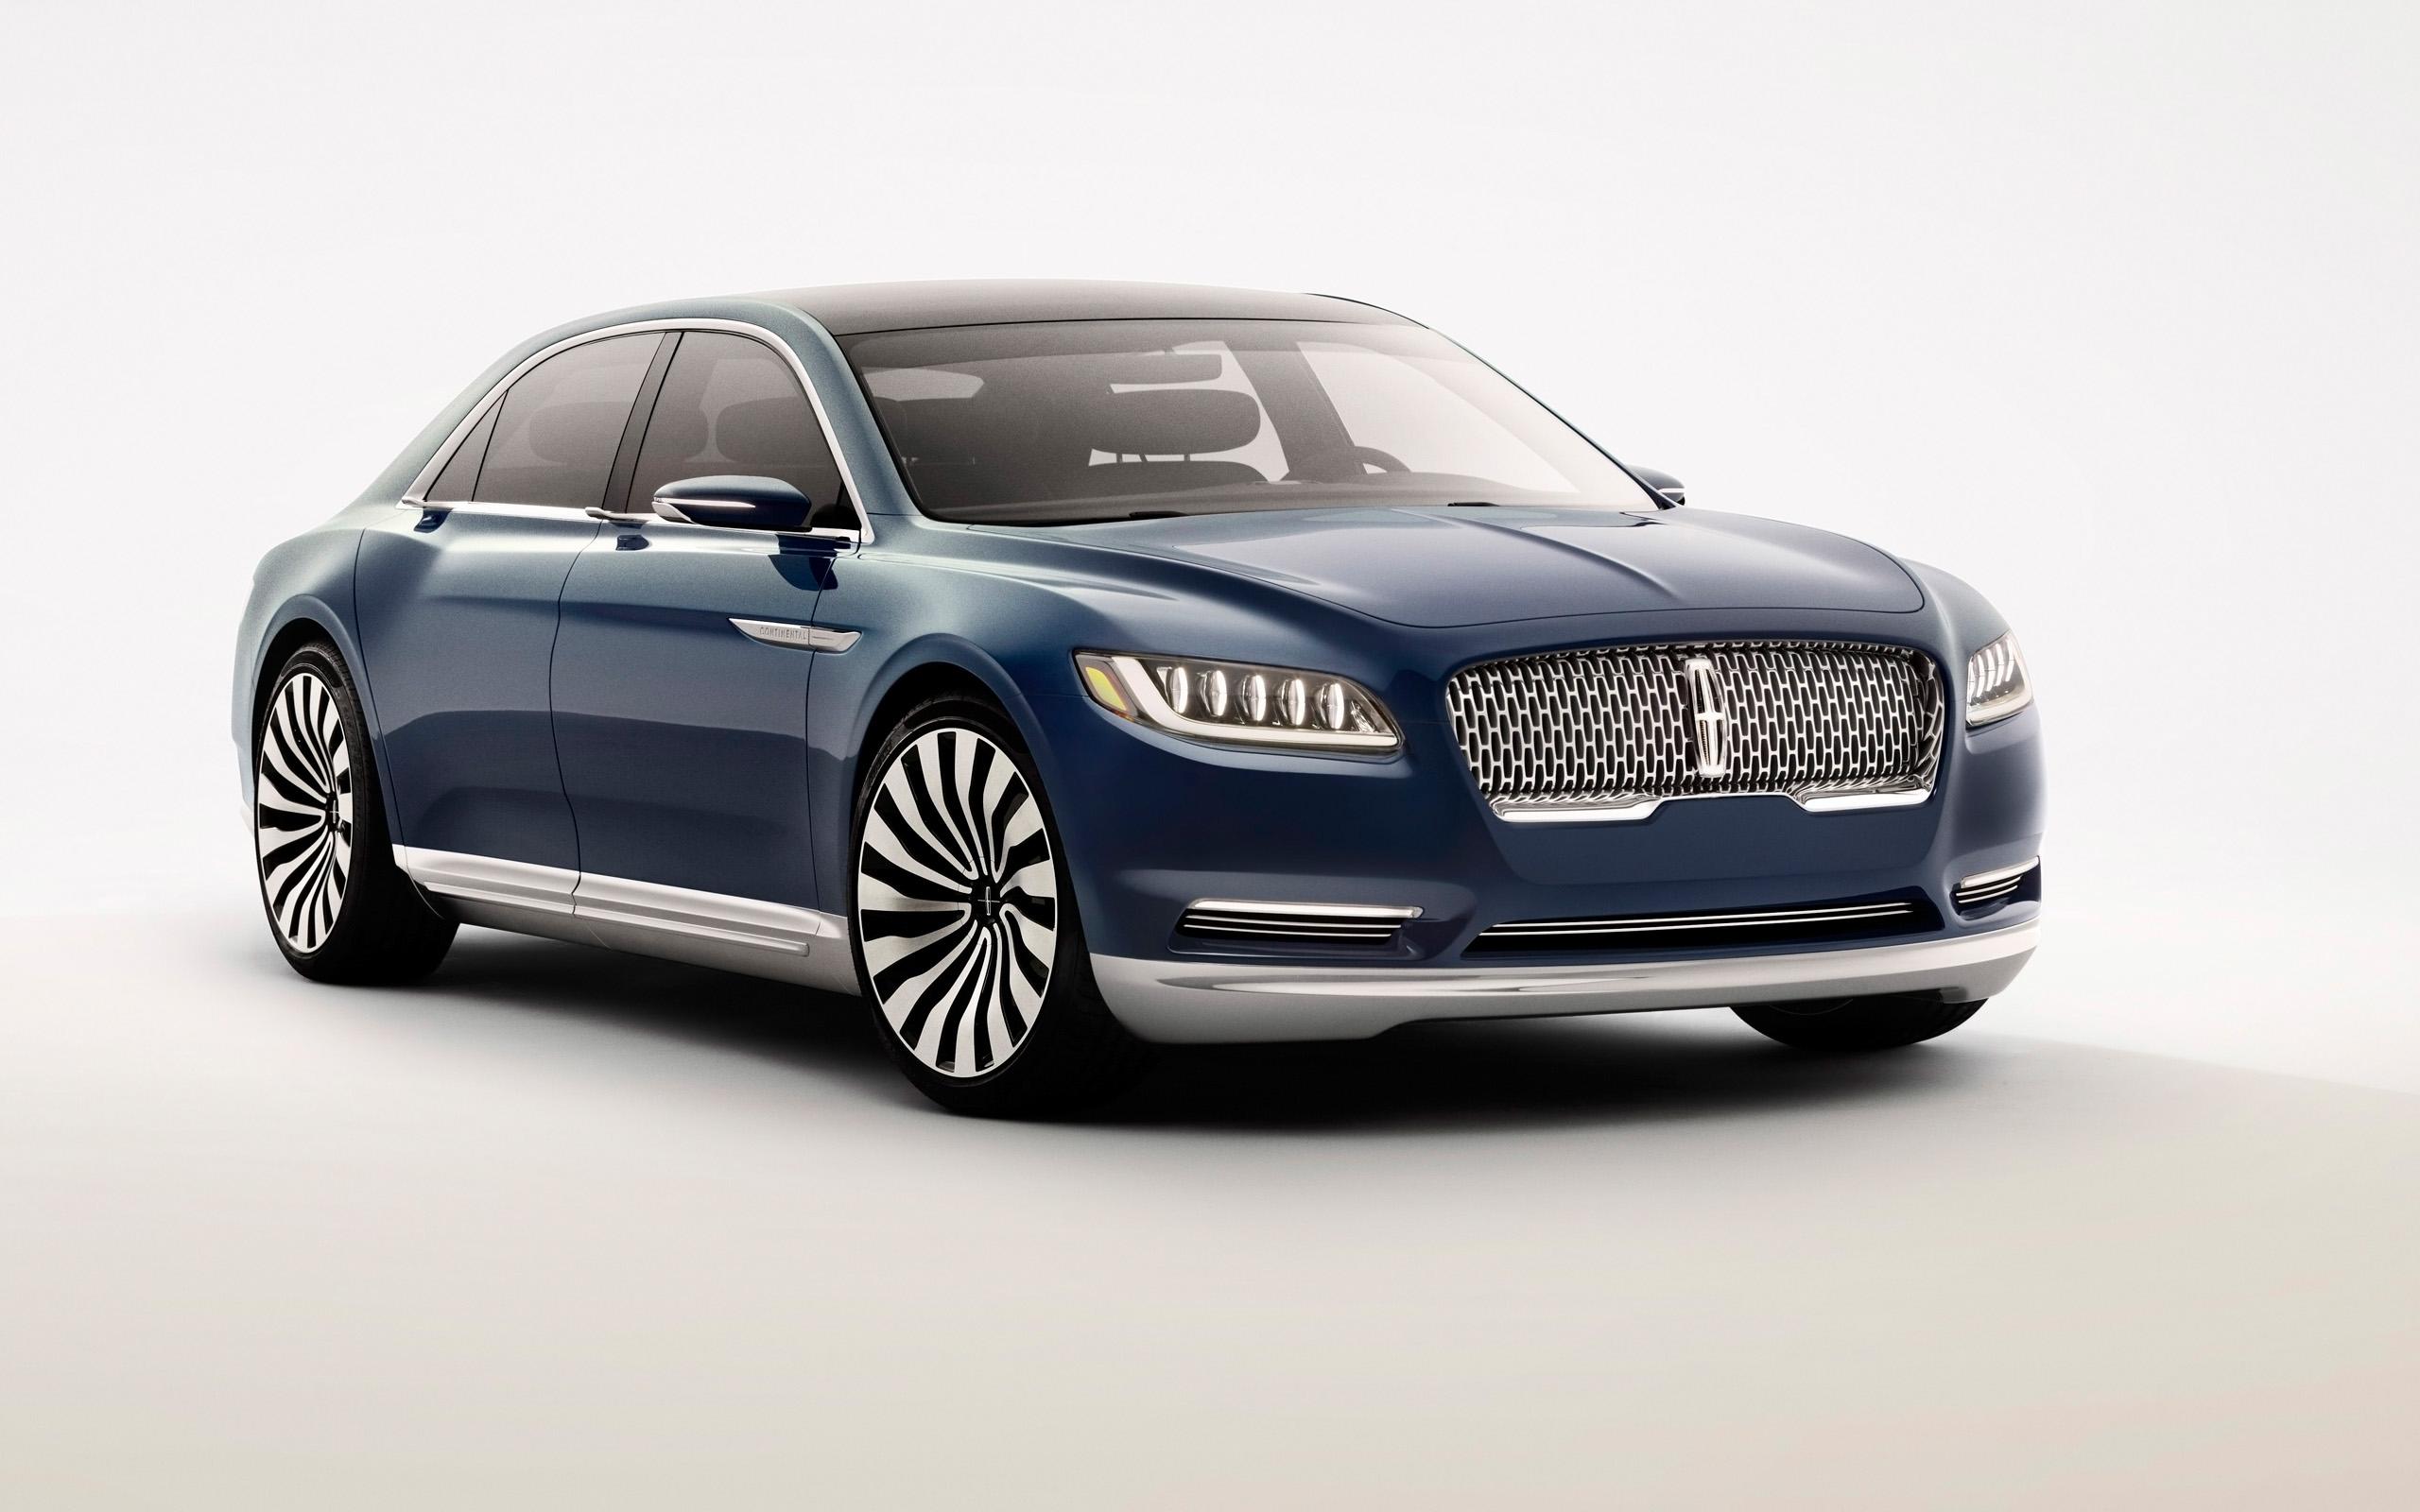 2015 Lincoln Continental Concept Wallpaper  Hd Car